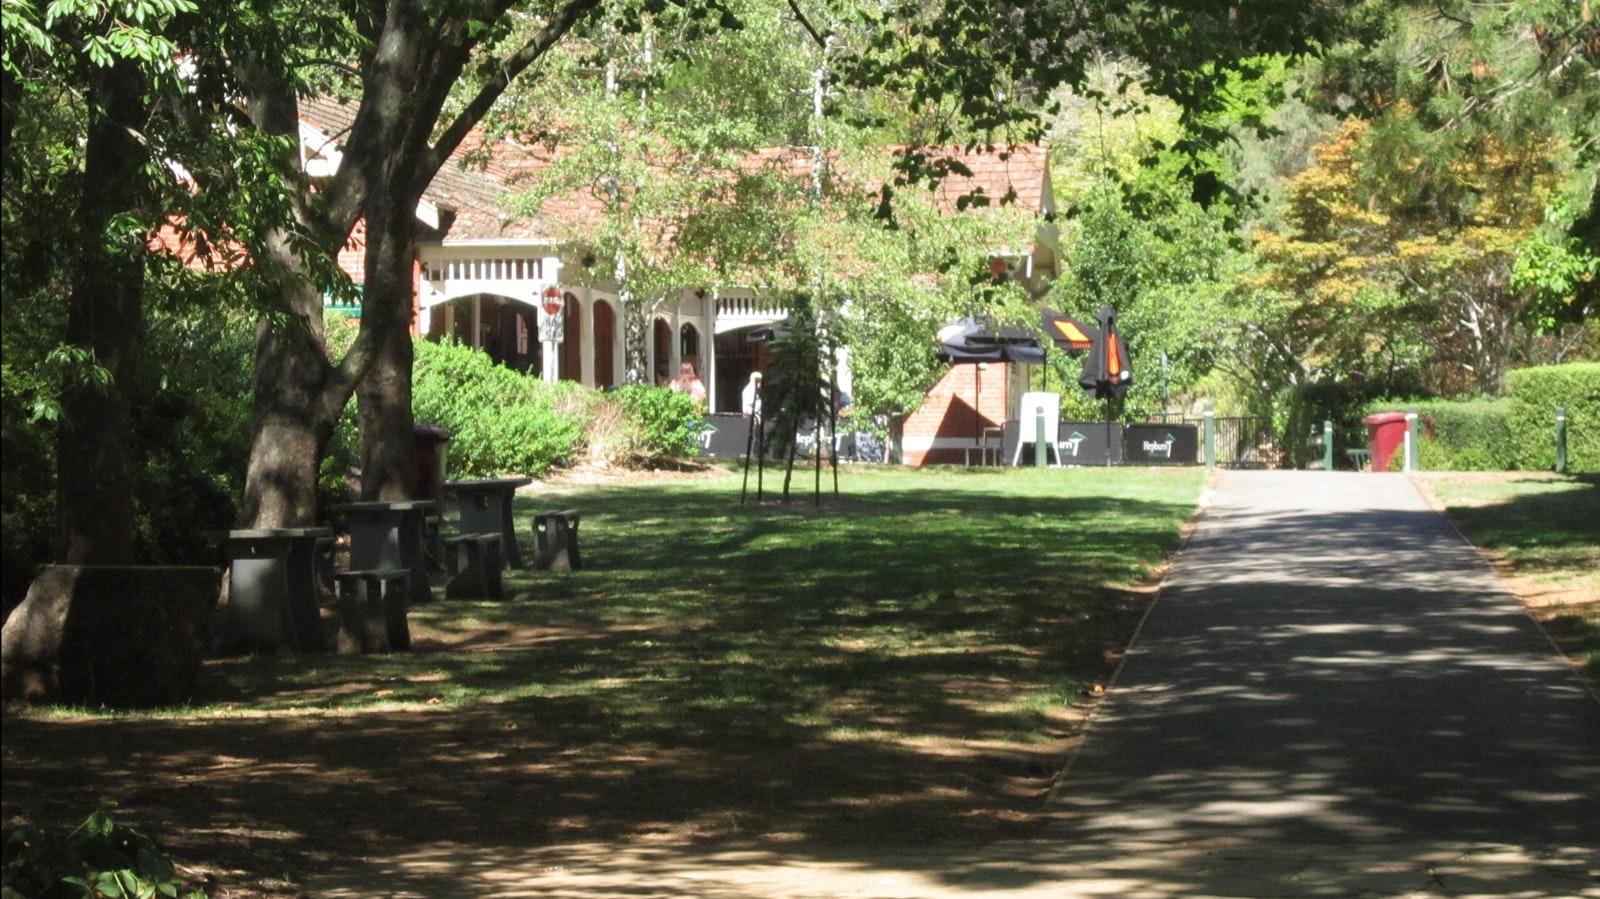 Pavilion Cafe Hepburn Springs Reserve - Hepburn Springs